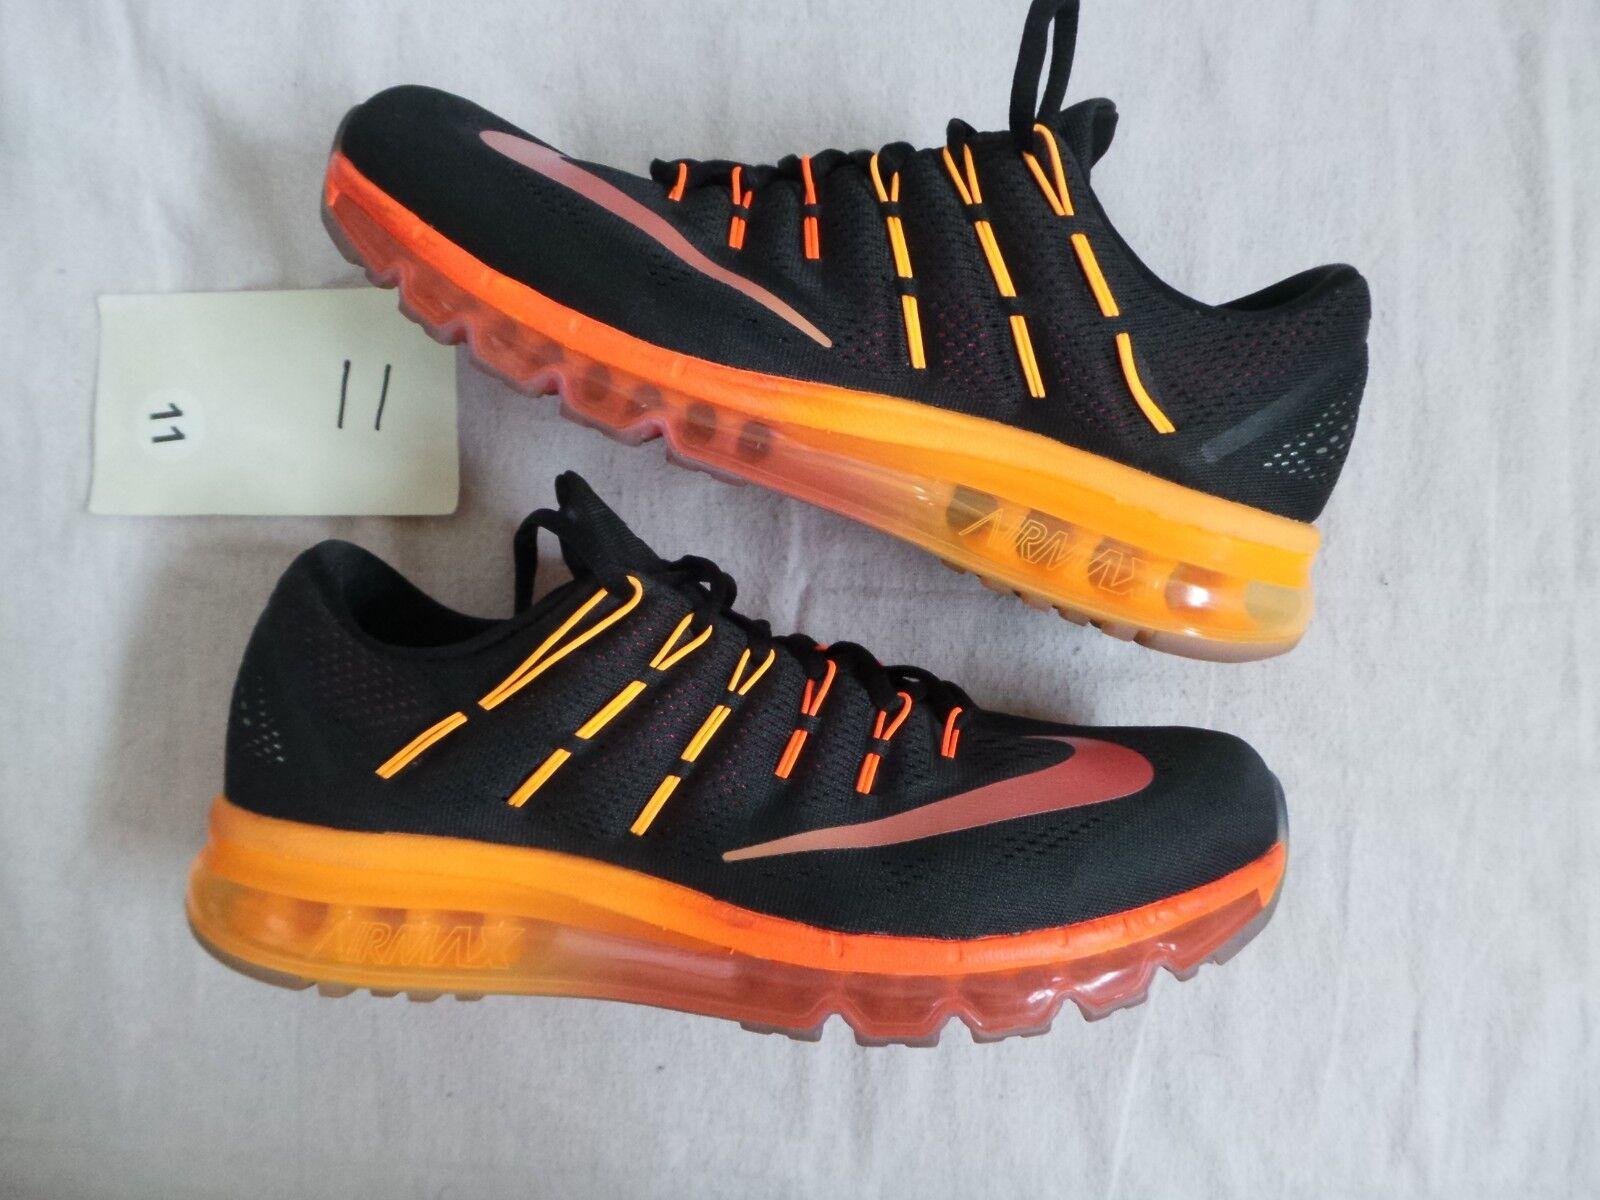 Nike air max 2016 nero arancio rosso cremisi 44 nds vapore vapormax flywire